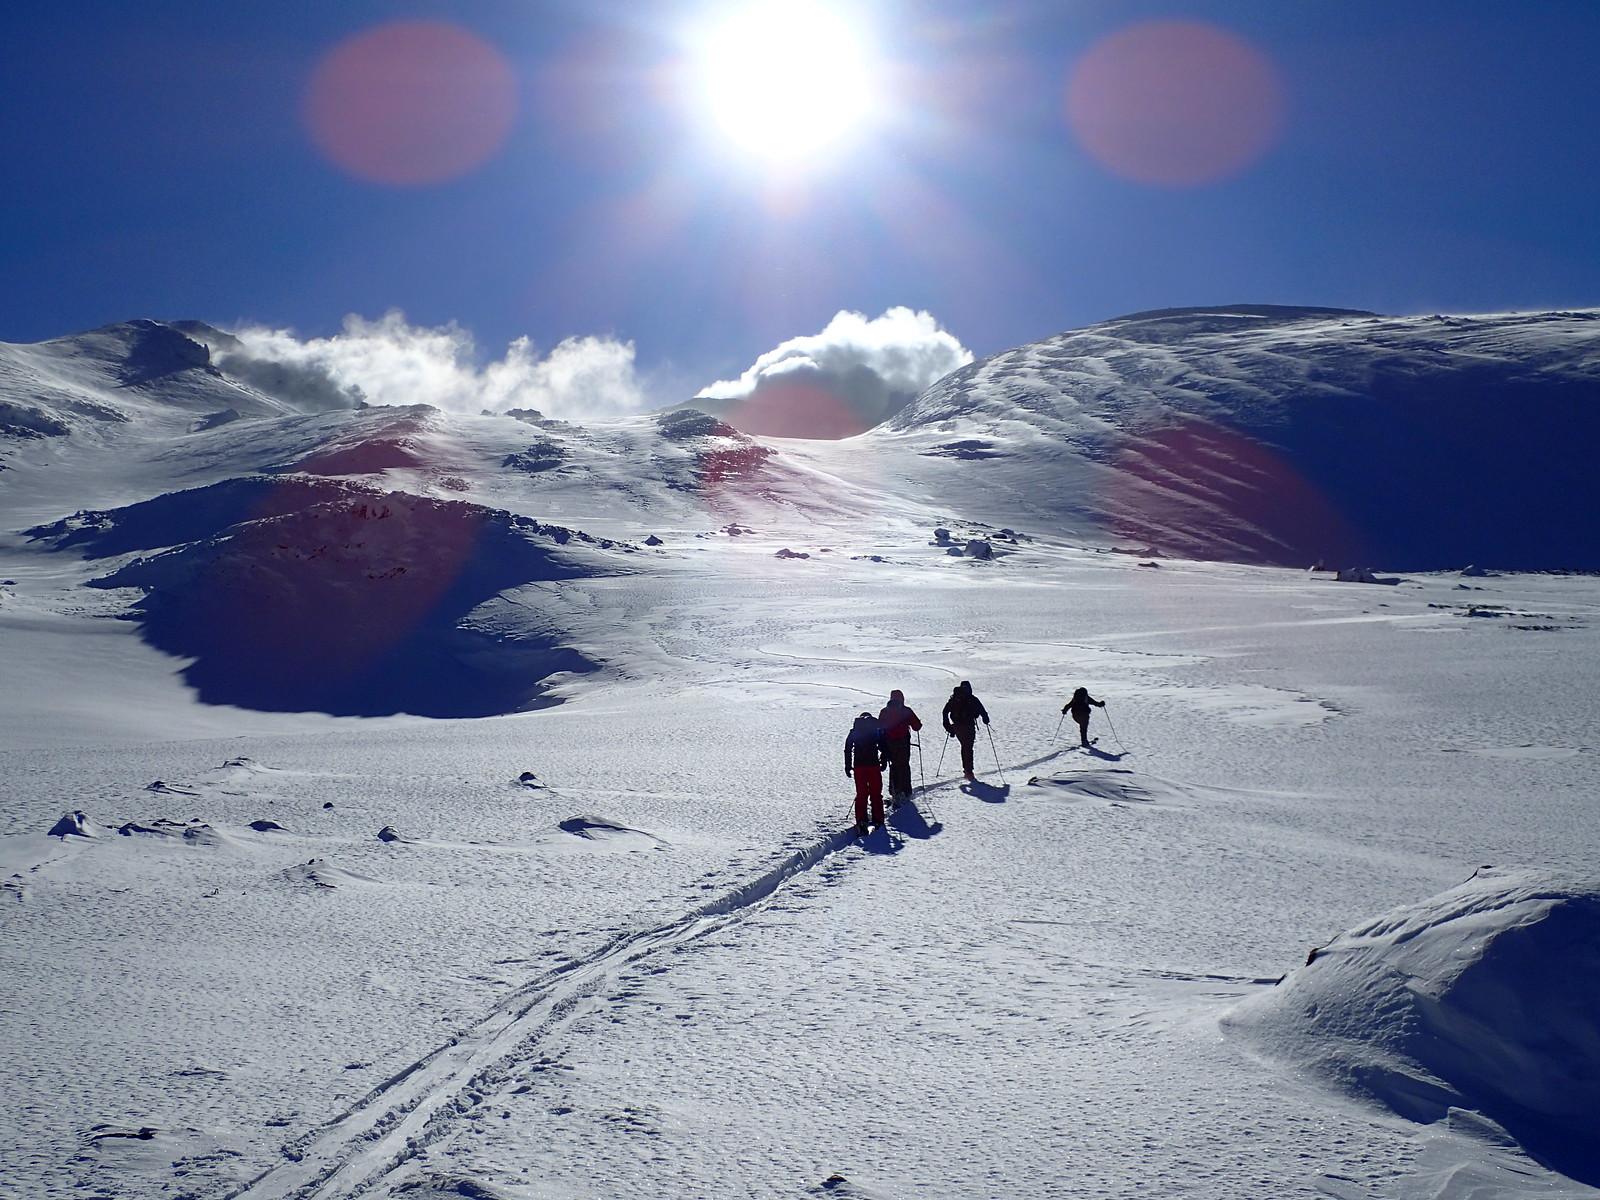 Mt. Maetokachi Taisho crater ski tour